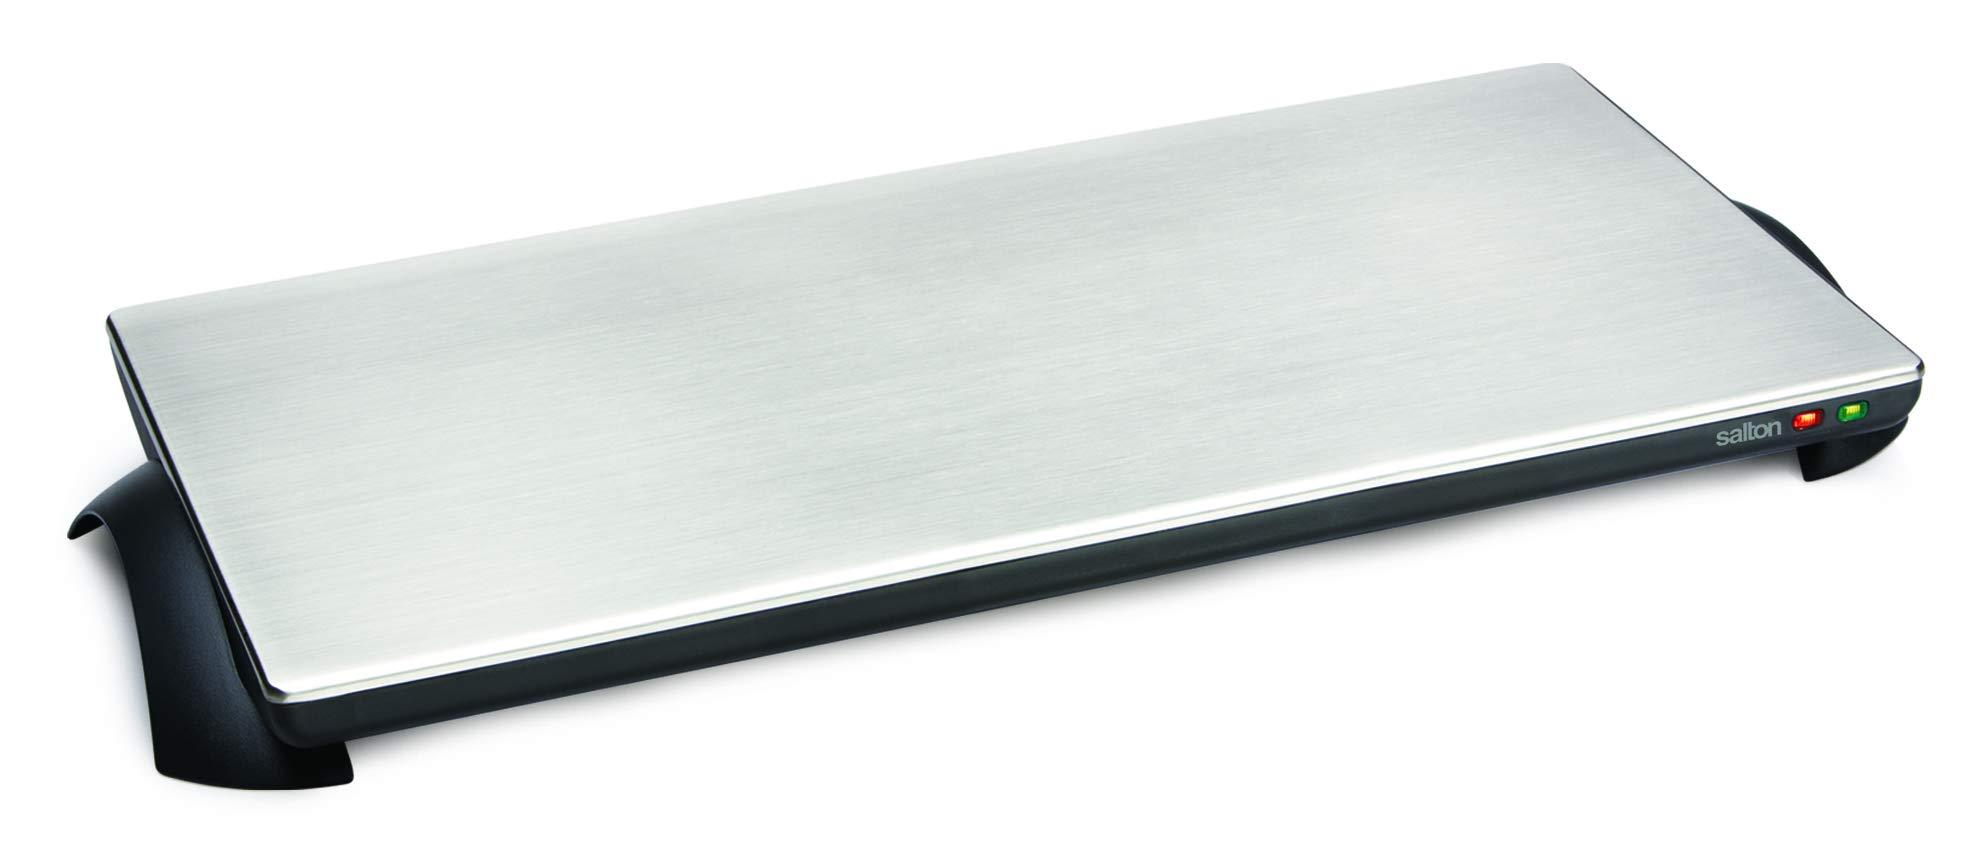 Salton TWT-40 Silhouette 1000-Watt Cordless Classic Stainless-Steel Warming Tray, 4 Plate by Salton